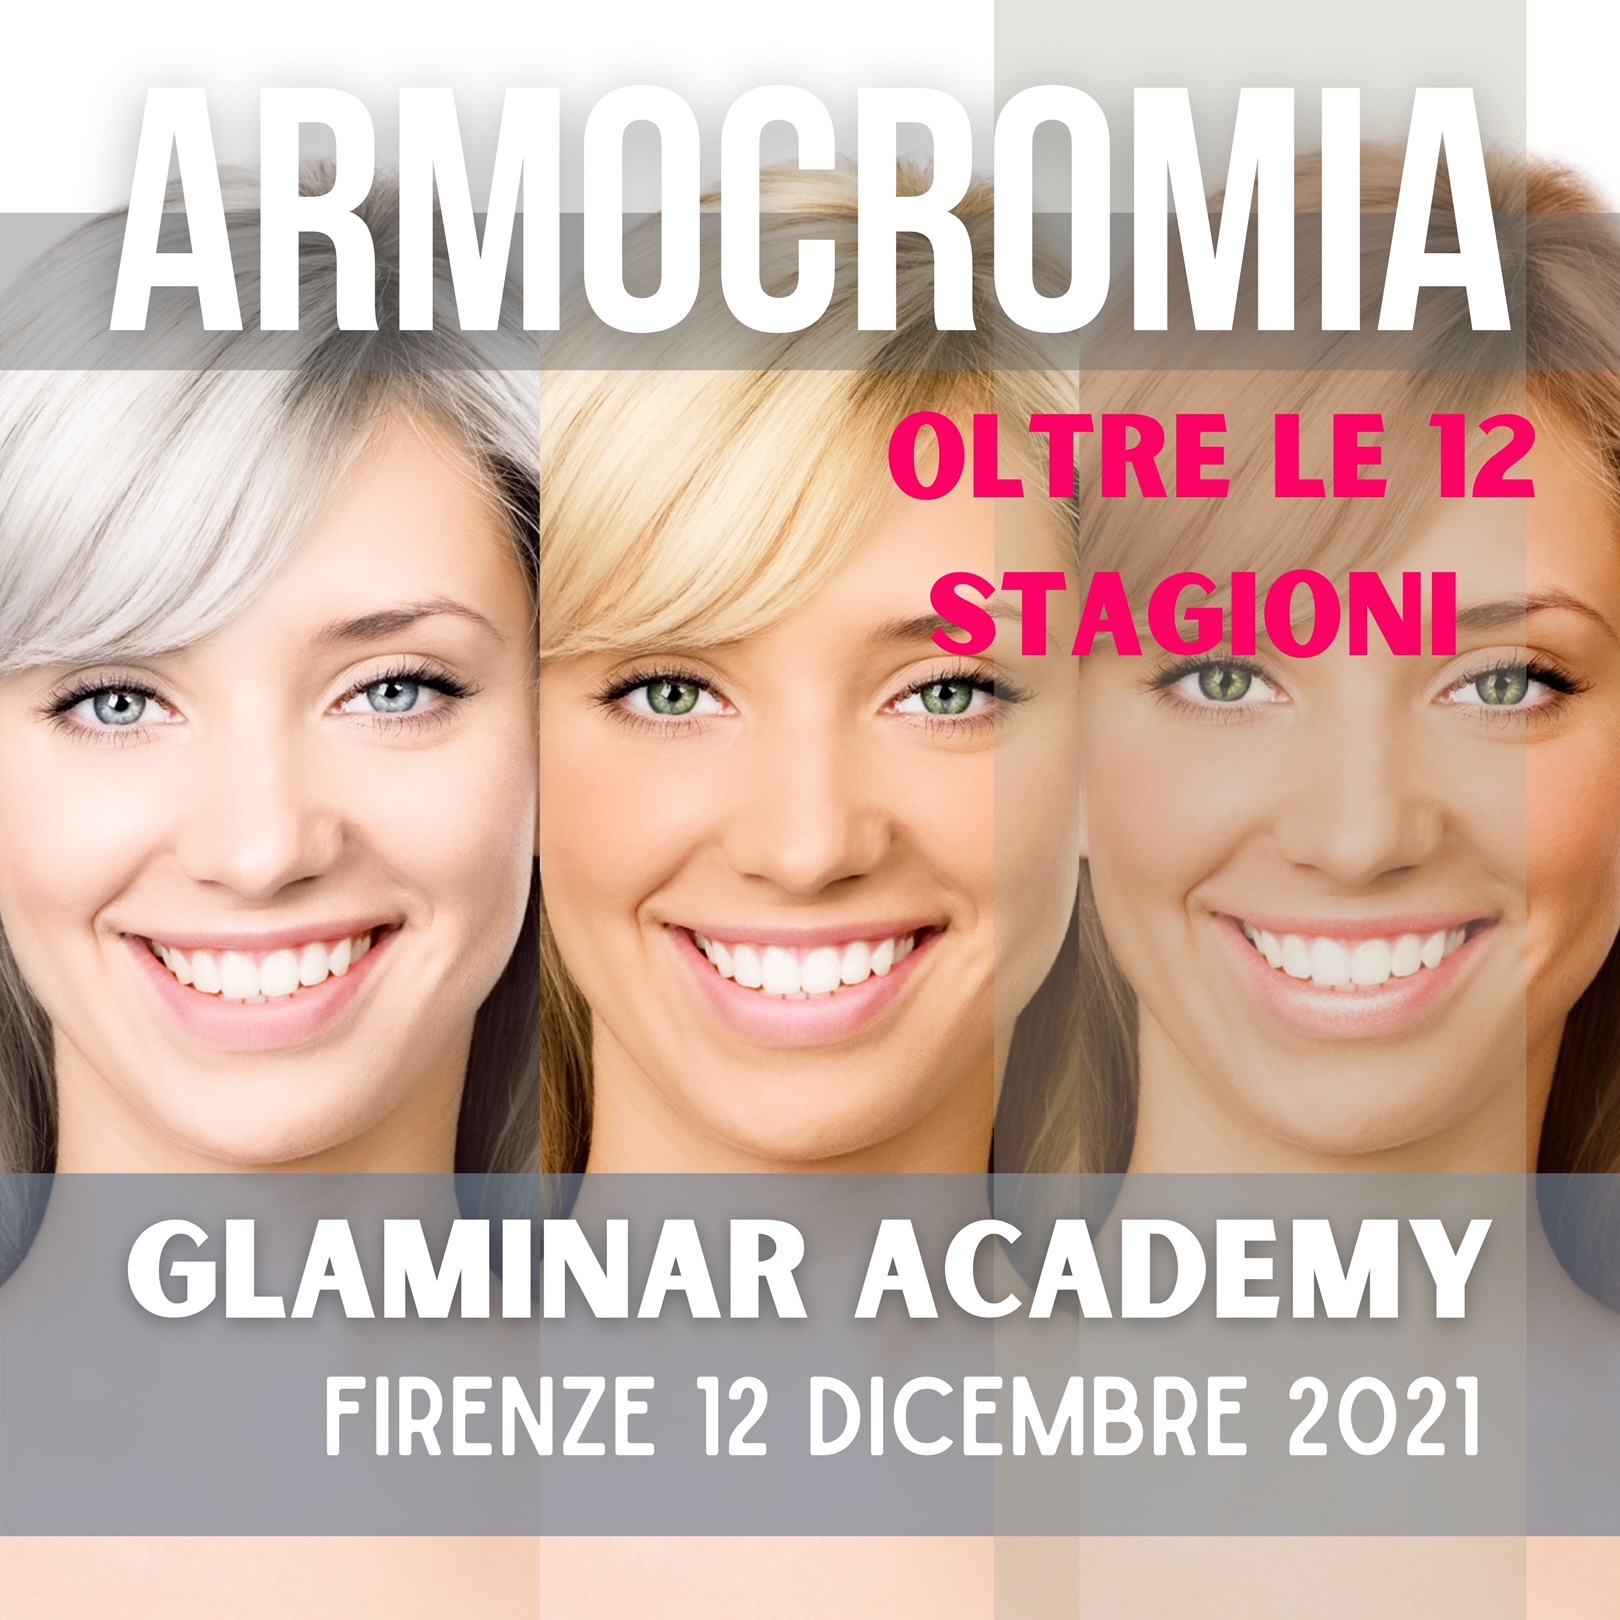 Workshop Armocromia Avanzato Firenze